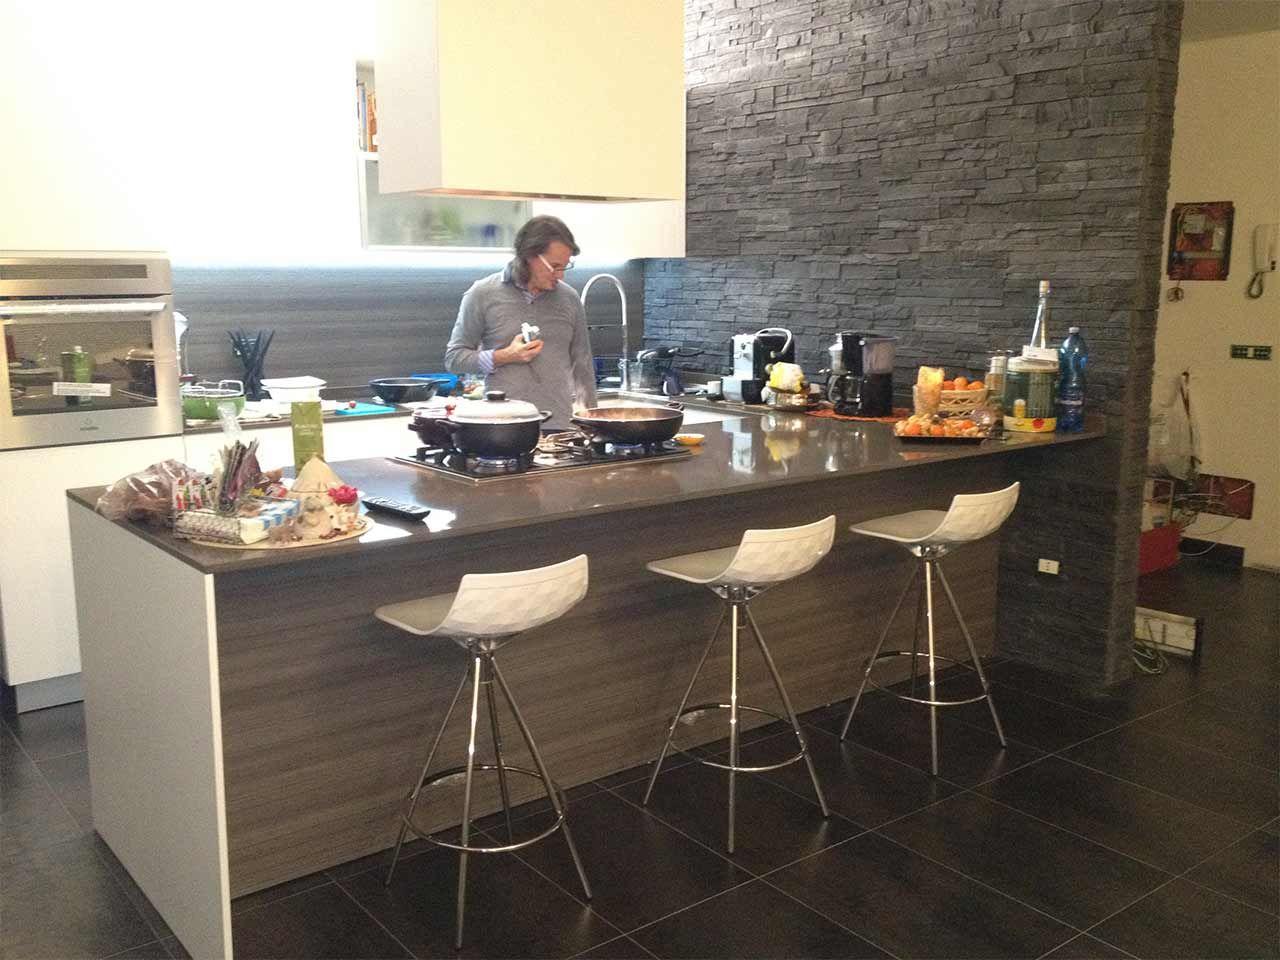 cucine con penisola - cerca con google | cucine | pinterest ... - Cucina Bianca Con Isola